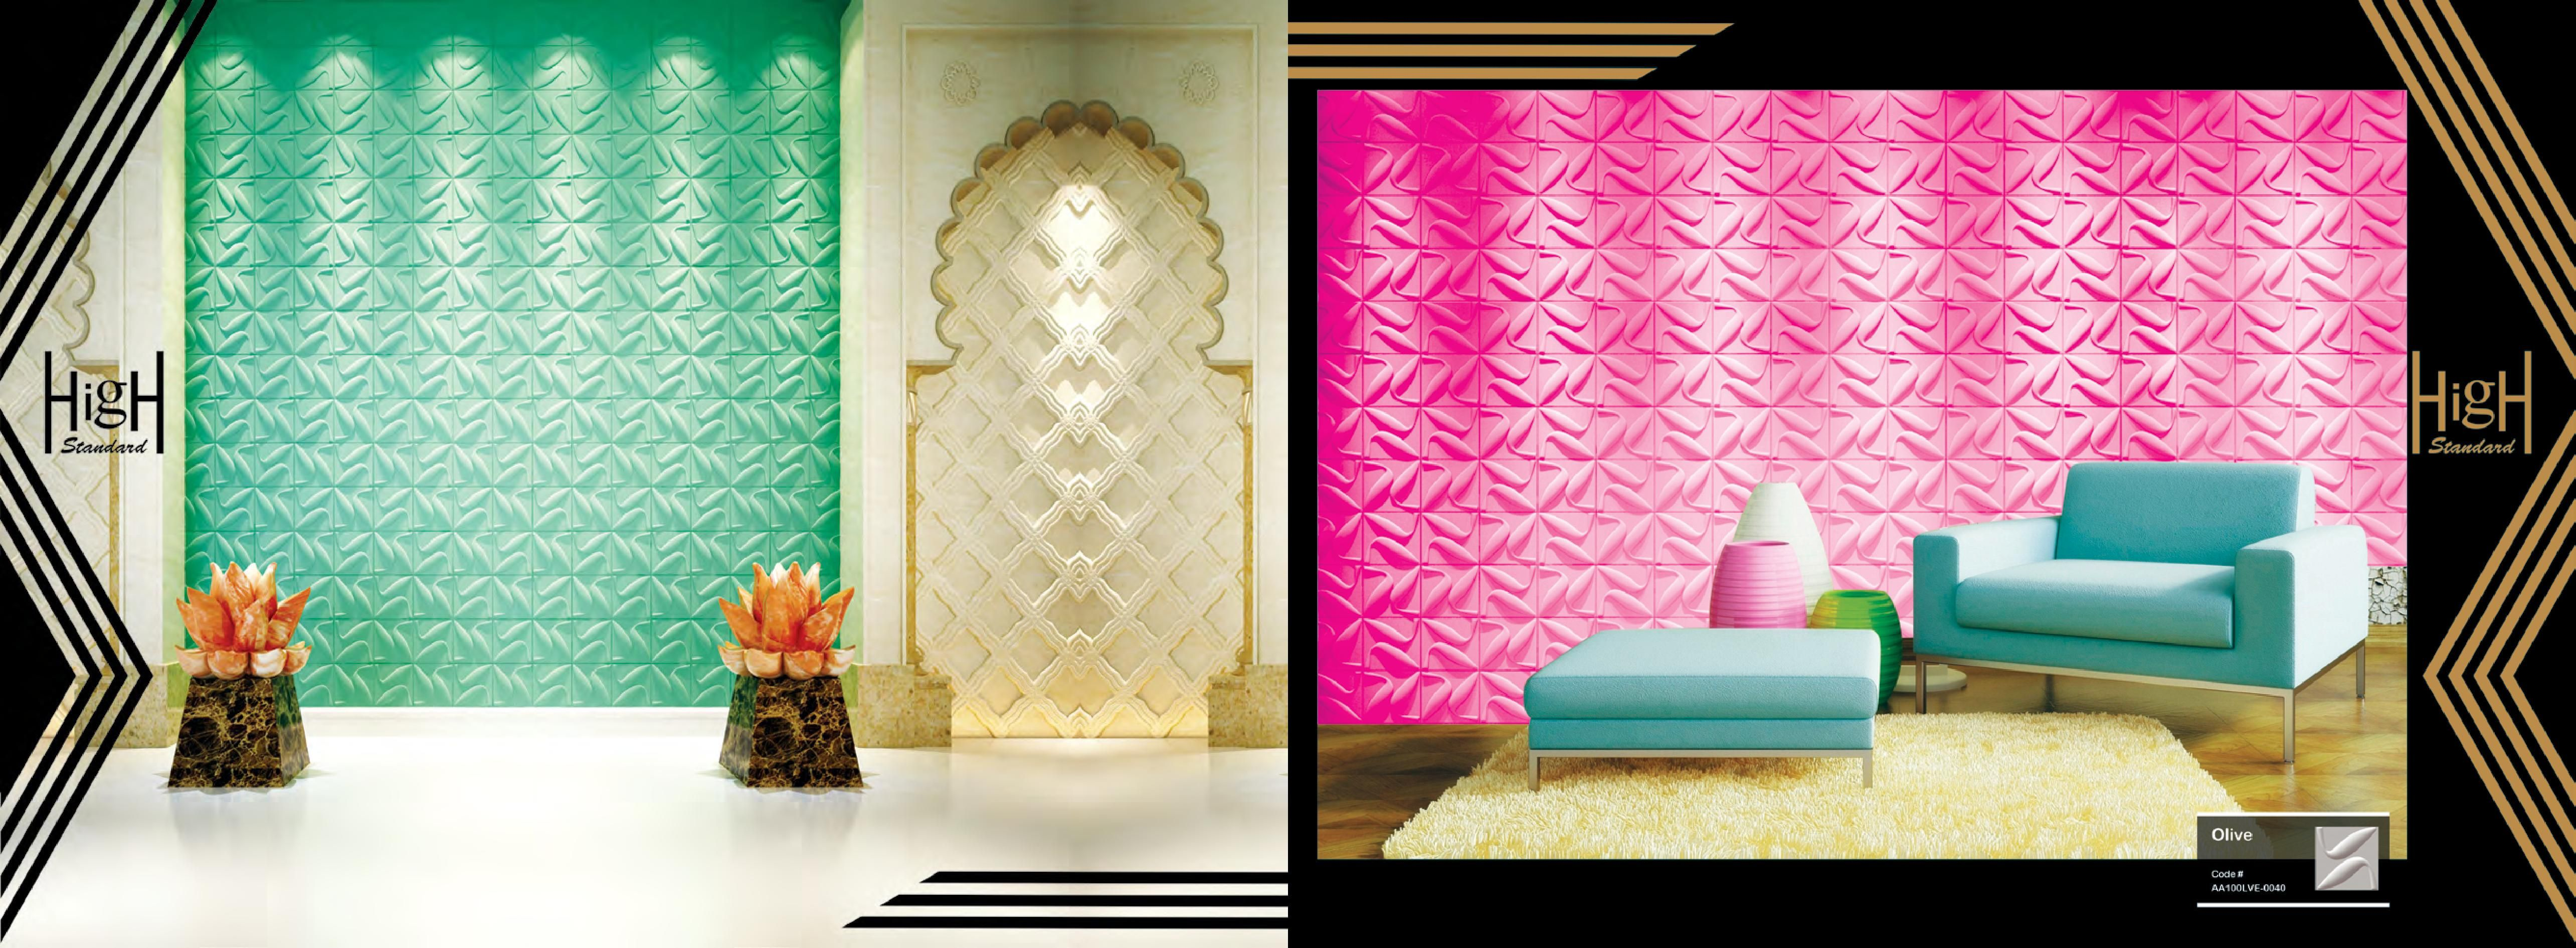 أحدث أشكال ورق الحائط 2014 كنت تعرف دي Home Decor Decor Curtains